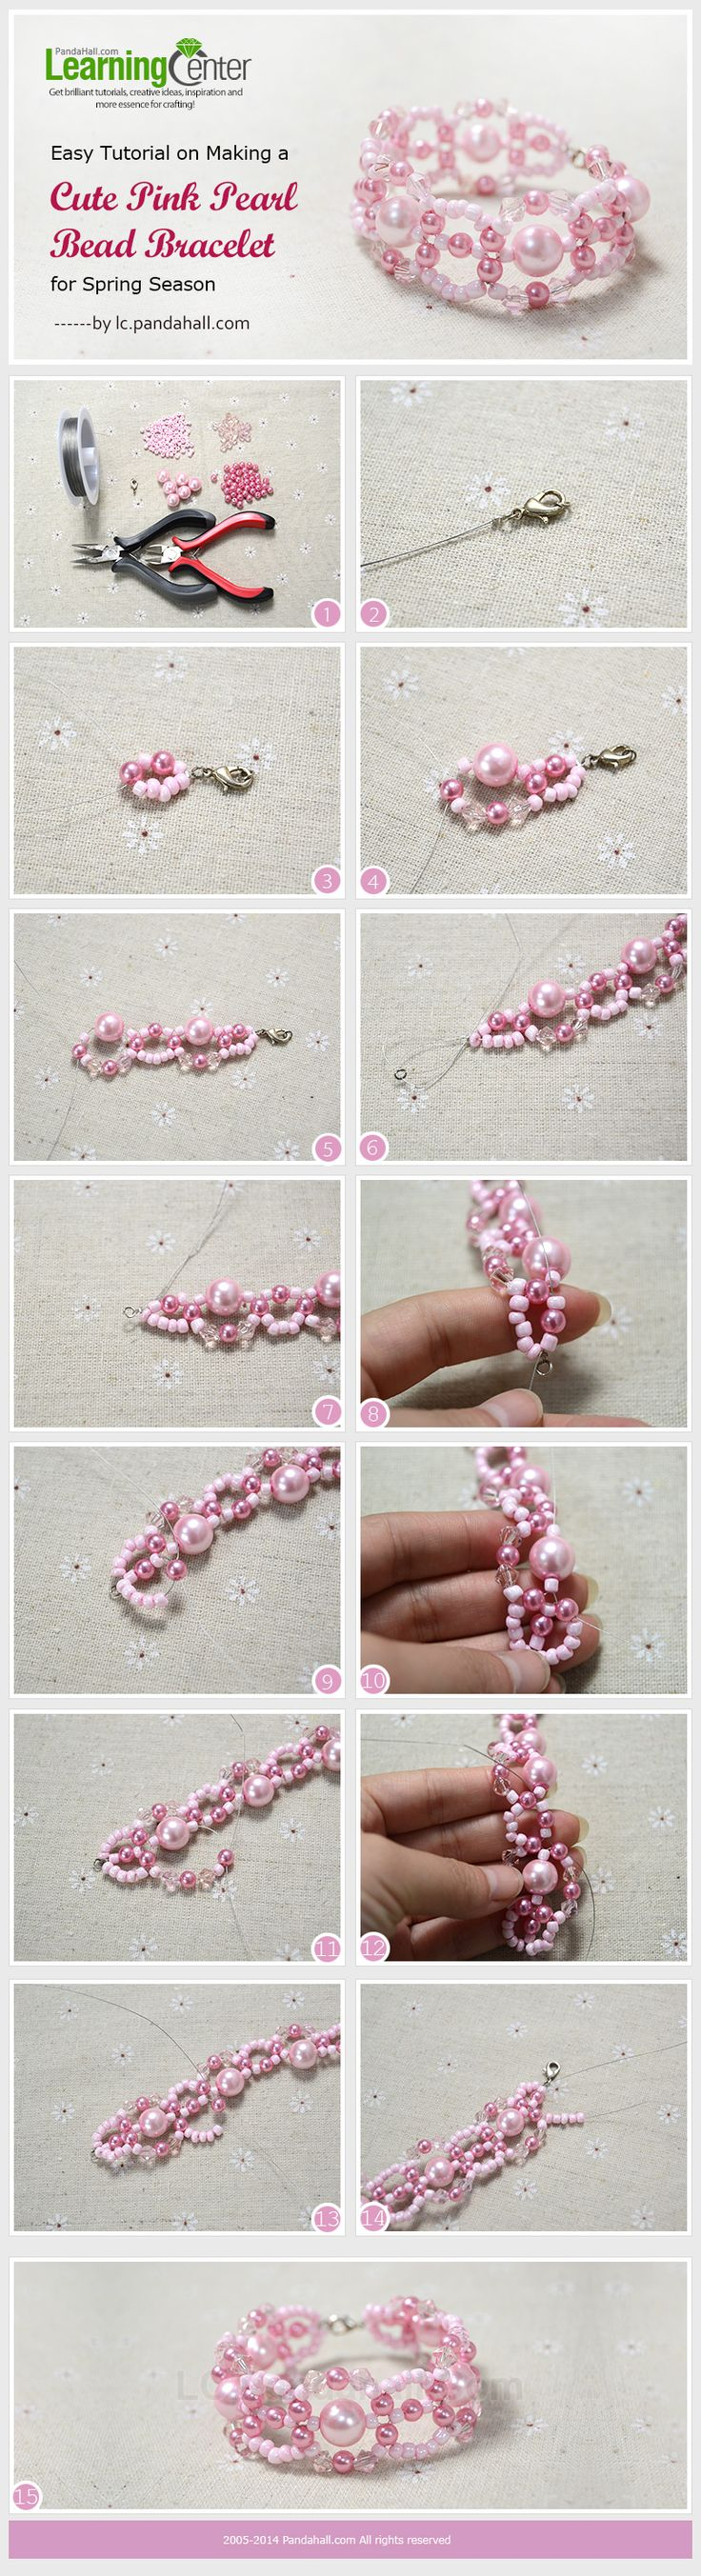 Easy Tutorial on Making a Cute Pink Pearl Bead Bracelet for Spring Season